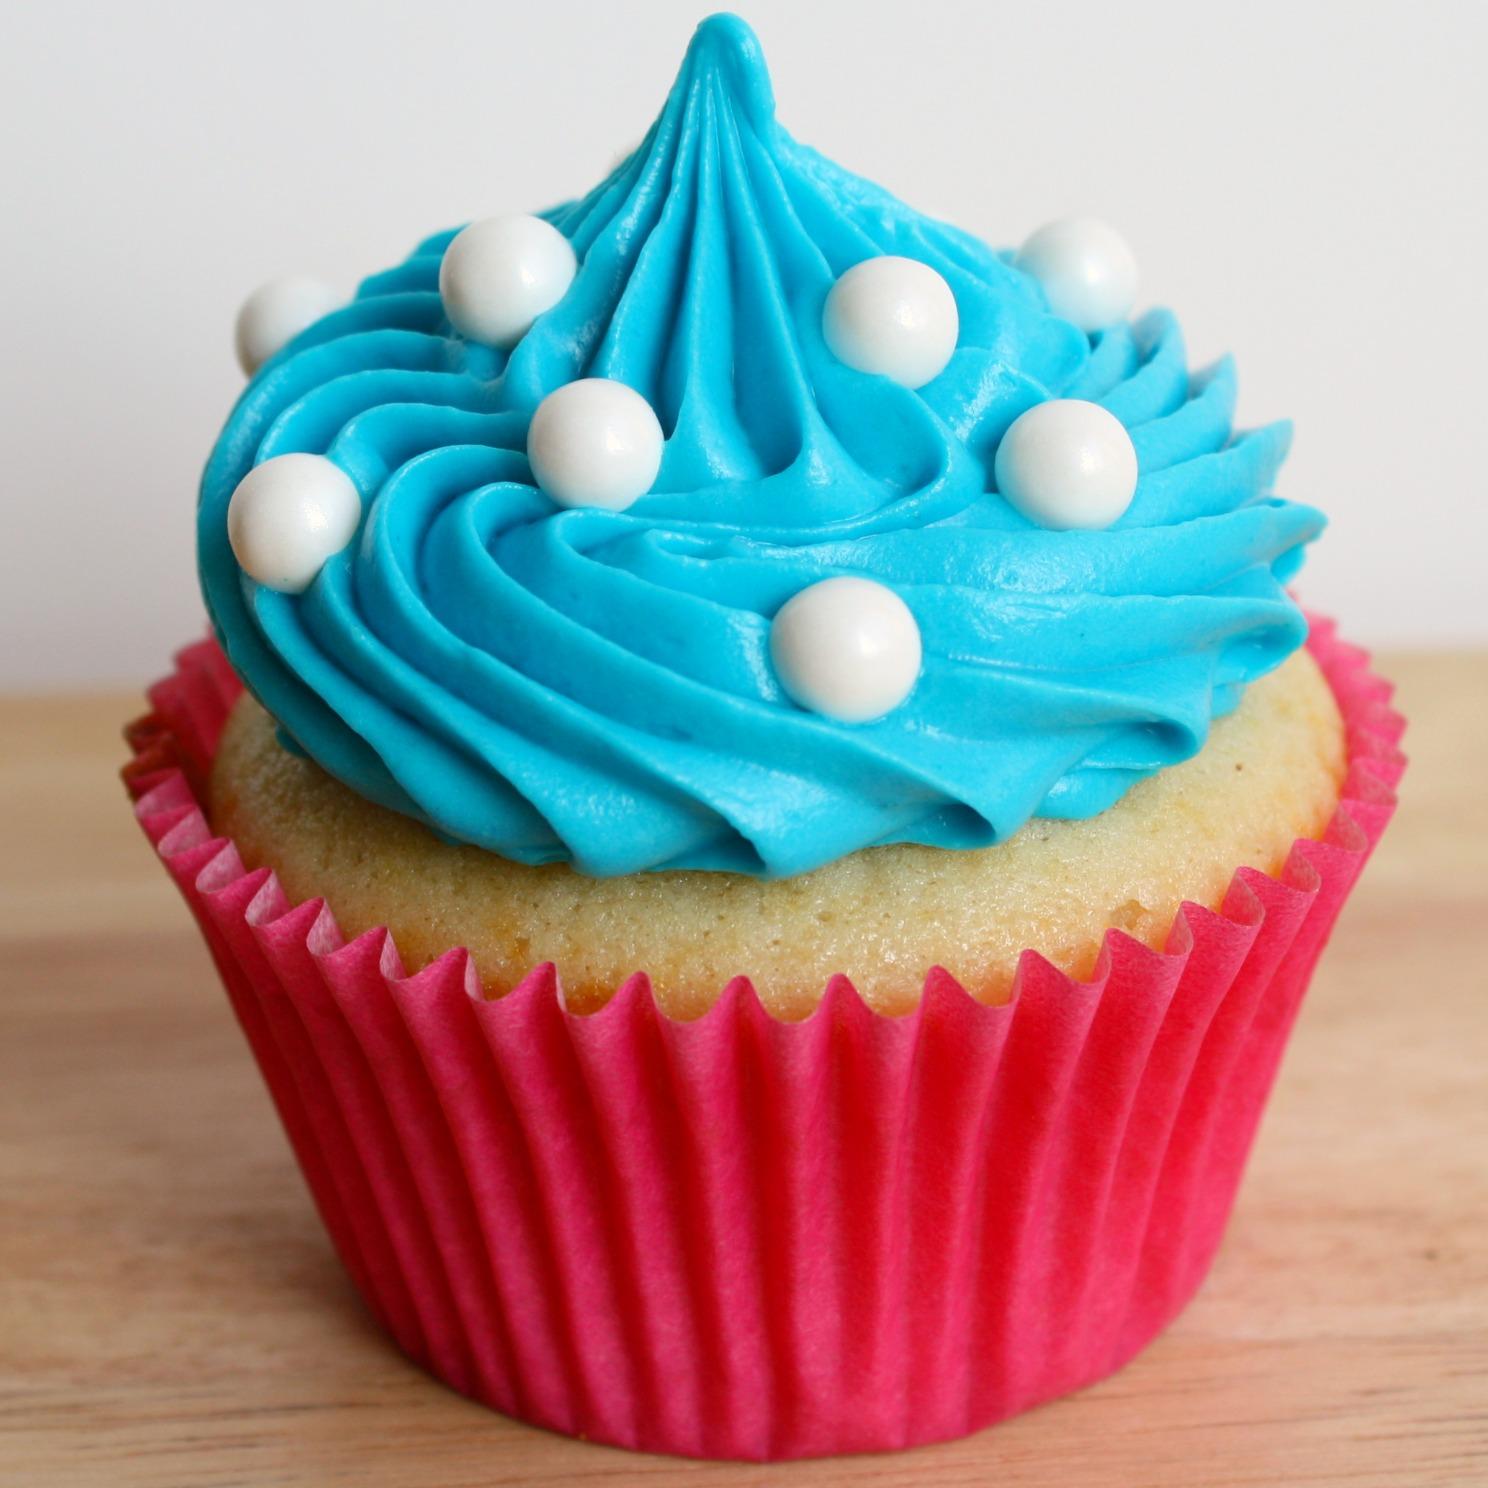 Vinilla Cupcakes